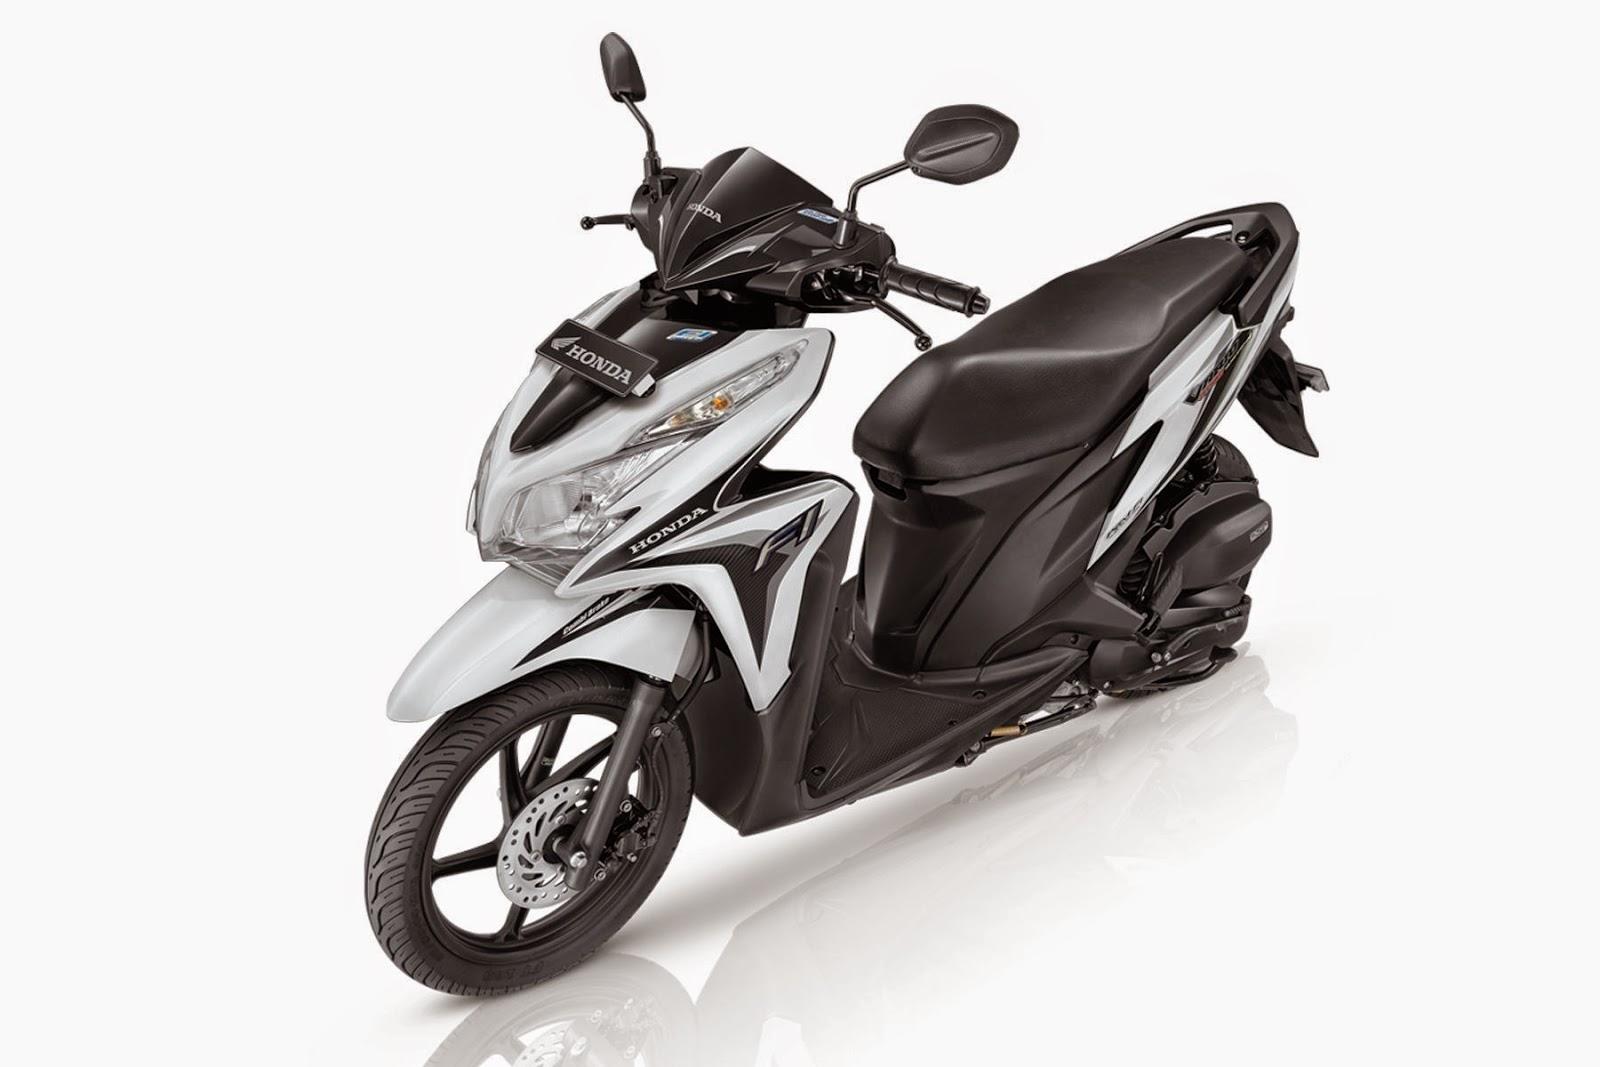 Harga Dan Spesifikasi Honda Old Vario Techno 125 Lama